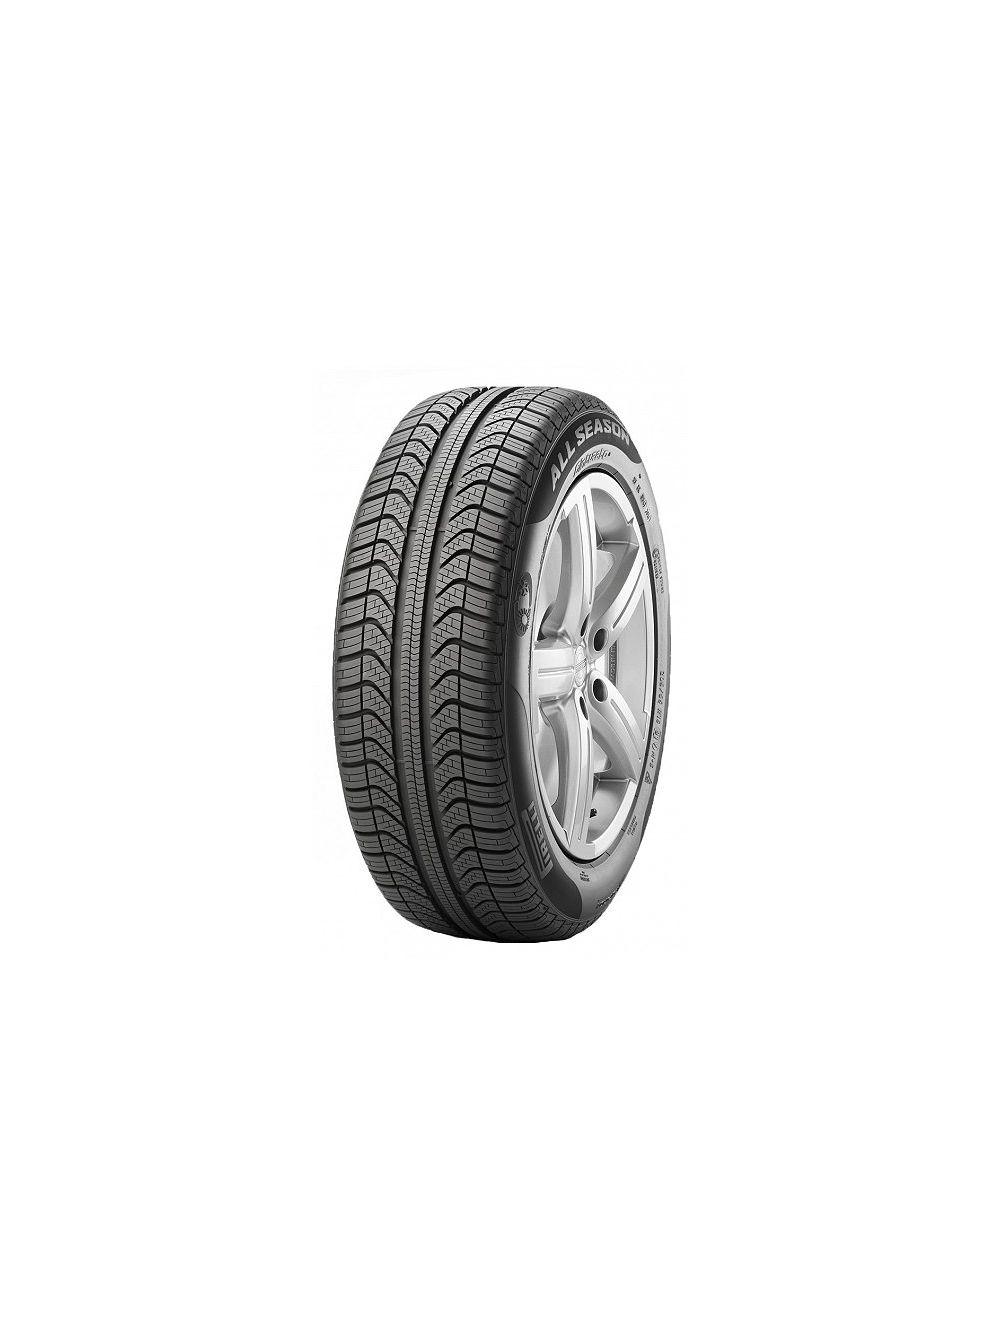 Pirelli 175/65R14 T Cinturato All Season MS Négyévszakos gumi